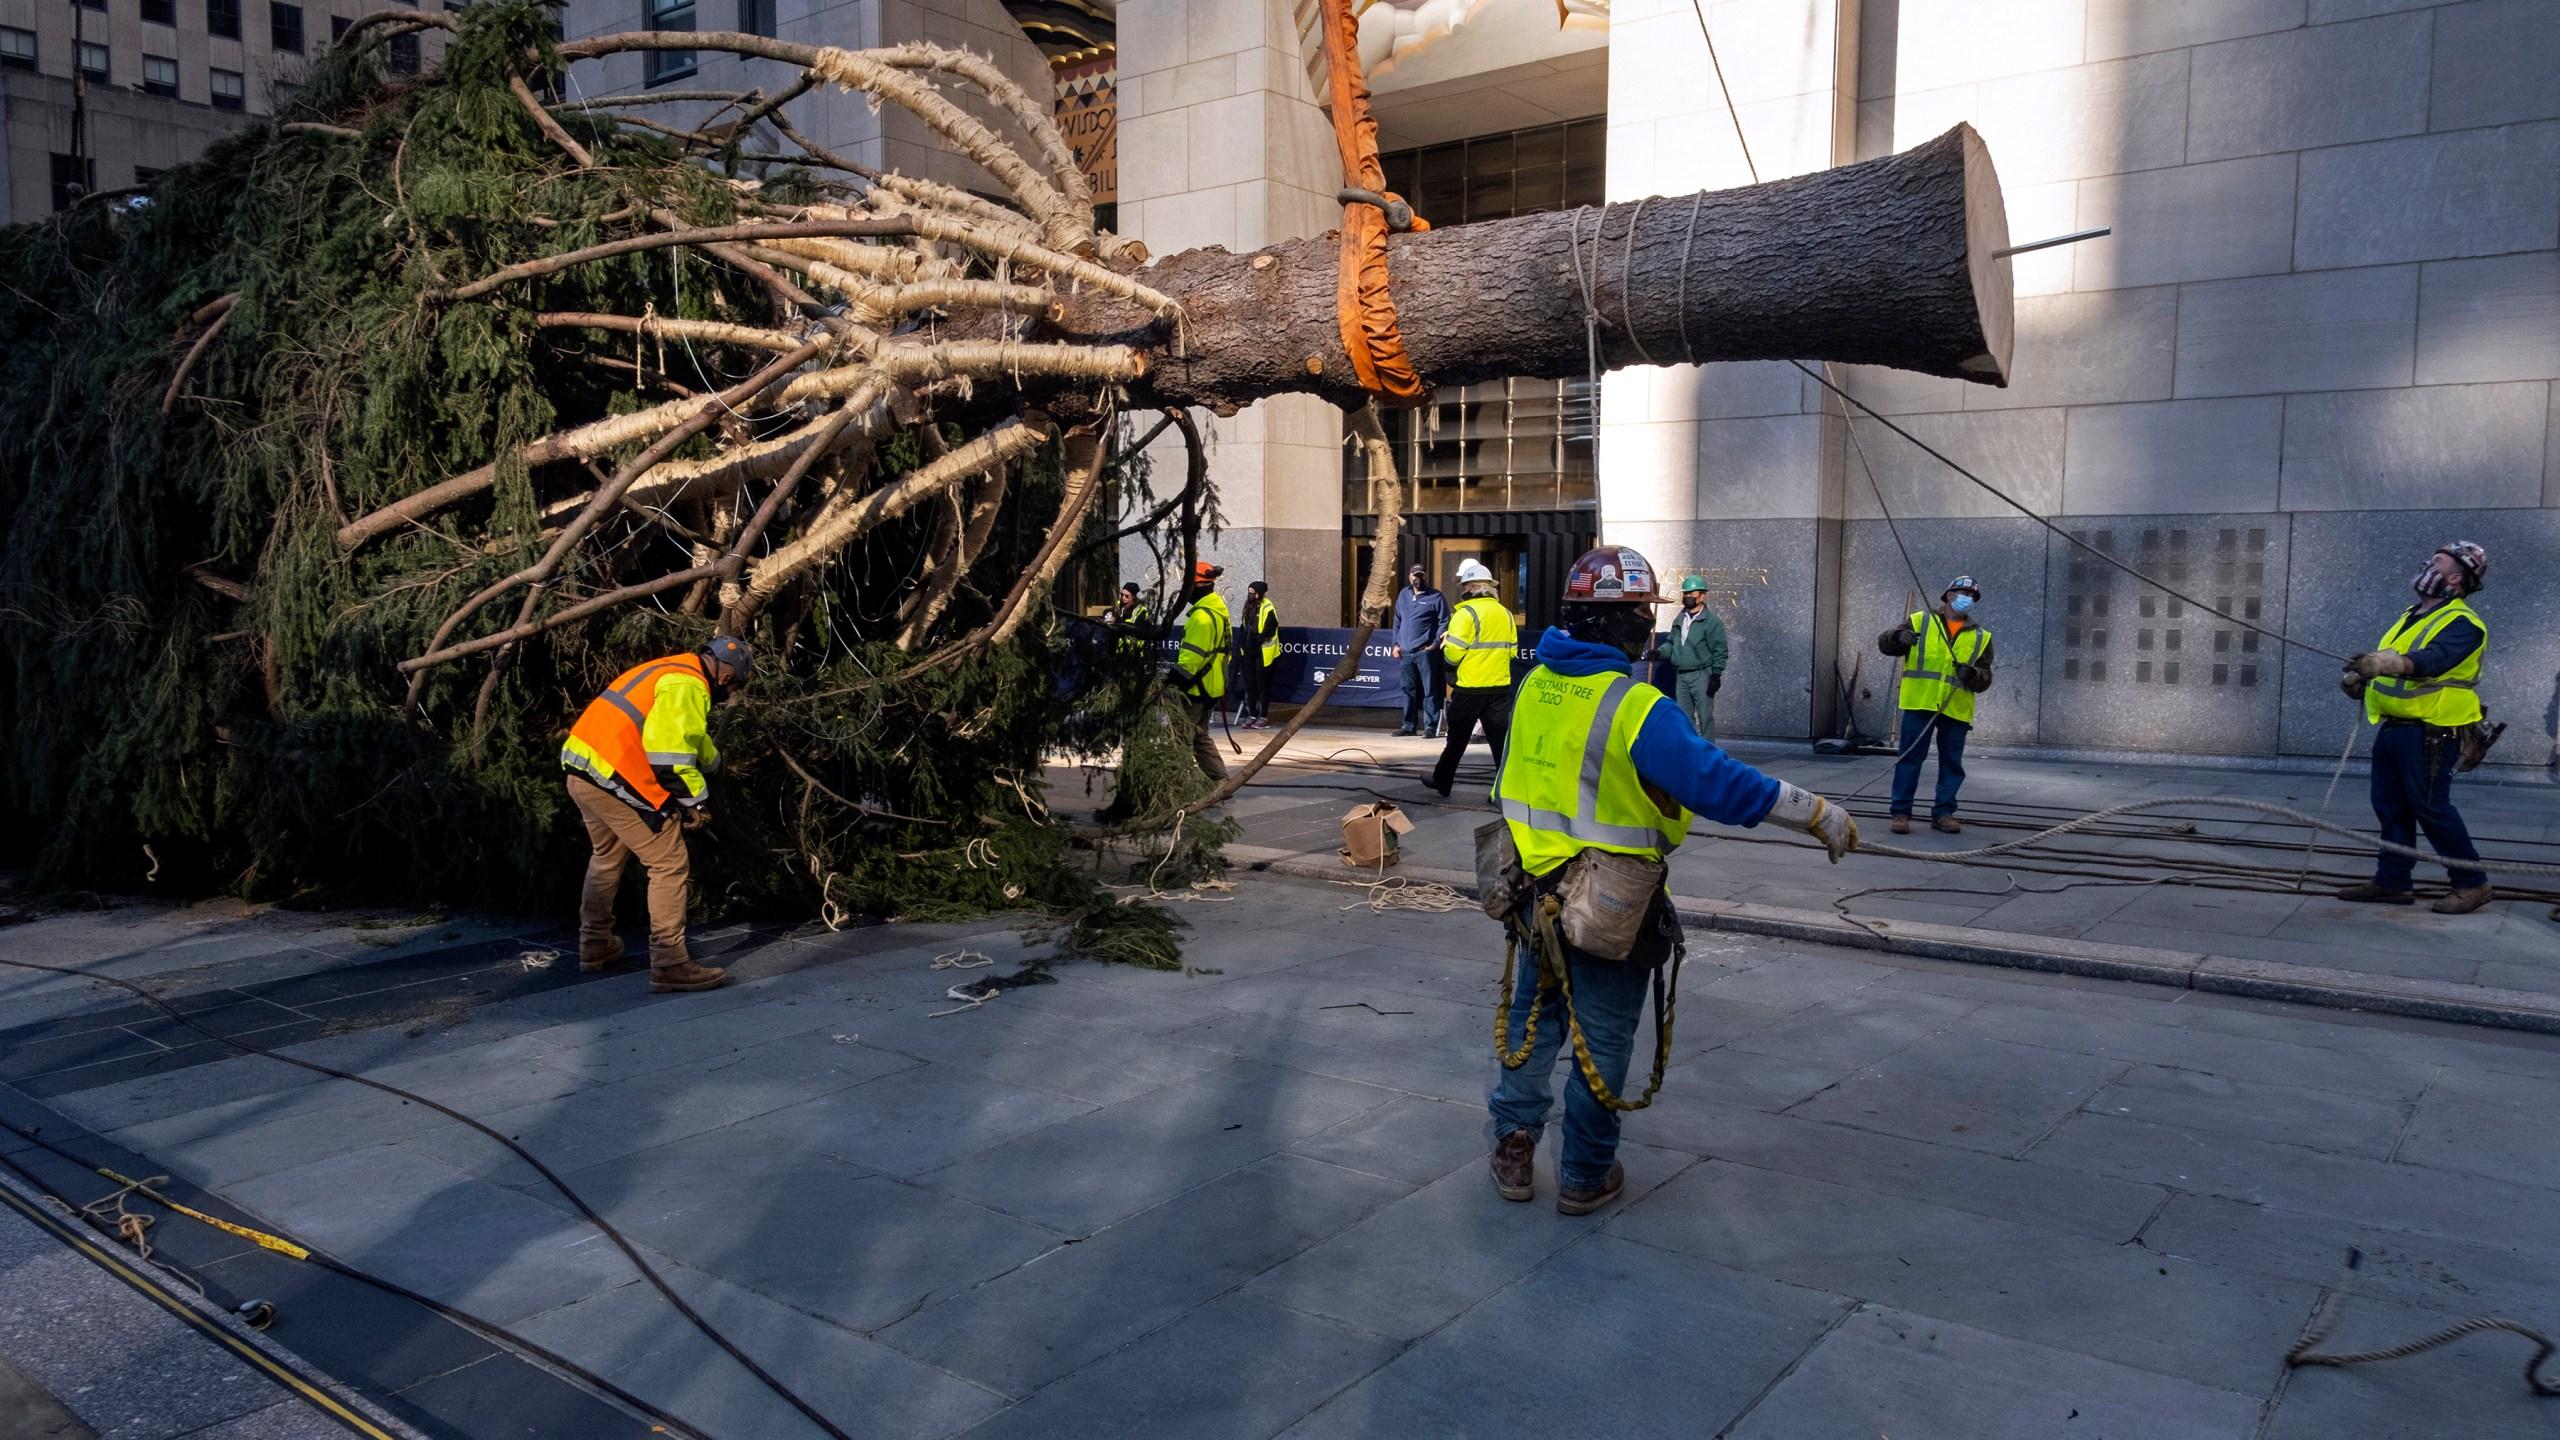 Christmas Programs, San Diego 2020 Rockefeller Center Christmas tree arrives; lighting Dec. 2 | FOX 5